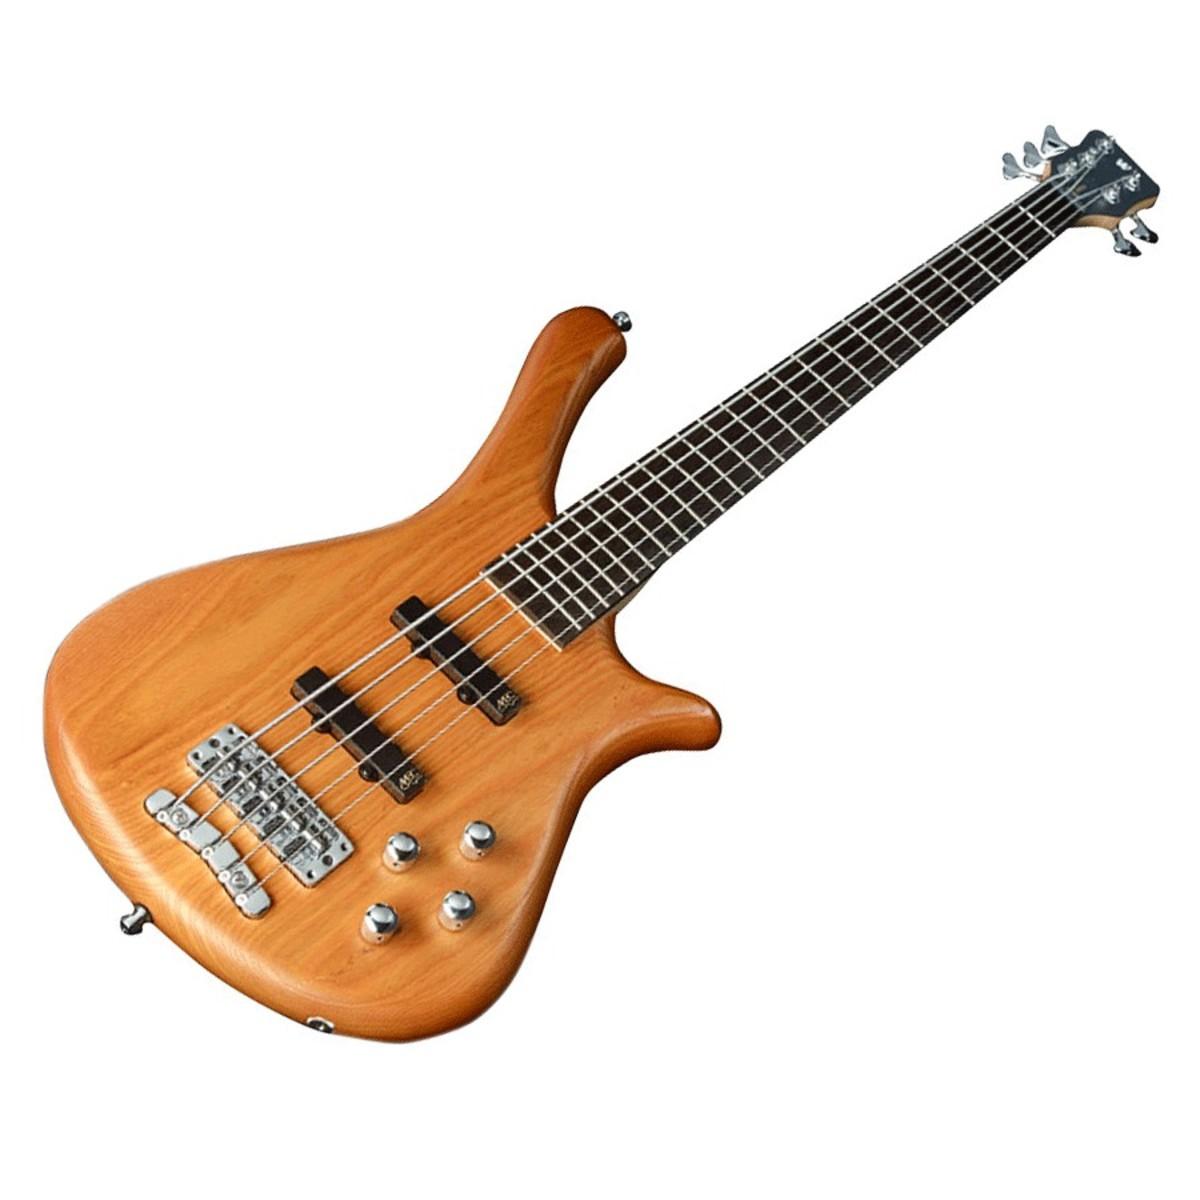 Warwick 5 String Bass : warwick rockbass fortress 5 string bass honey at ~ Vivirlamusica.com Haus und Dekorationen